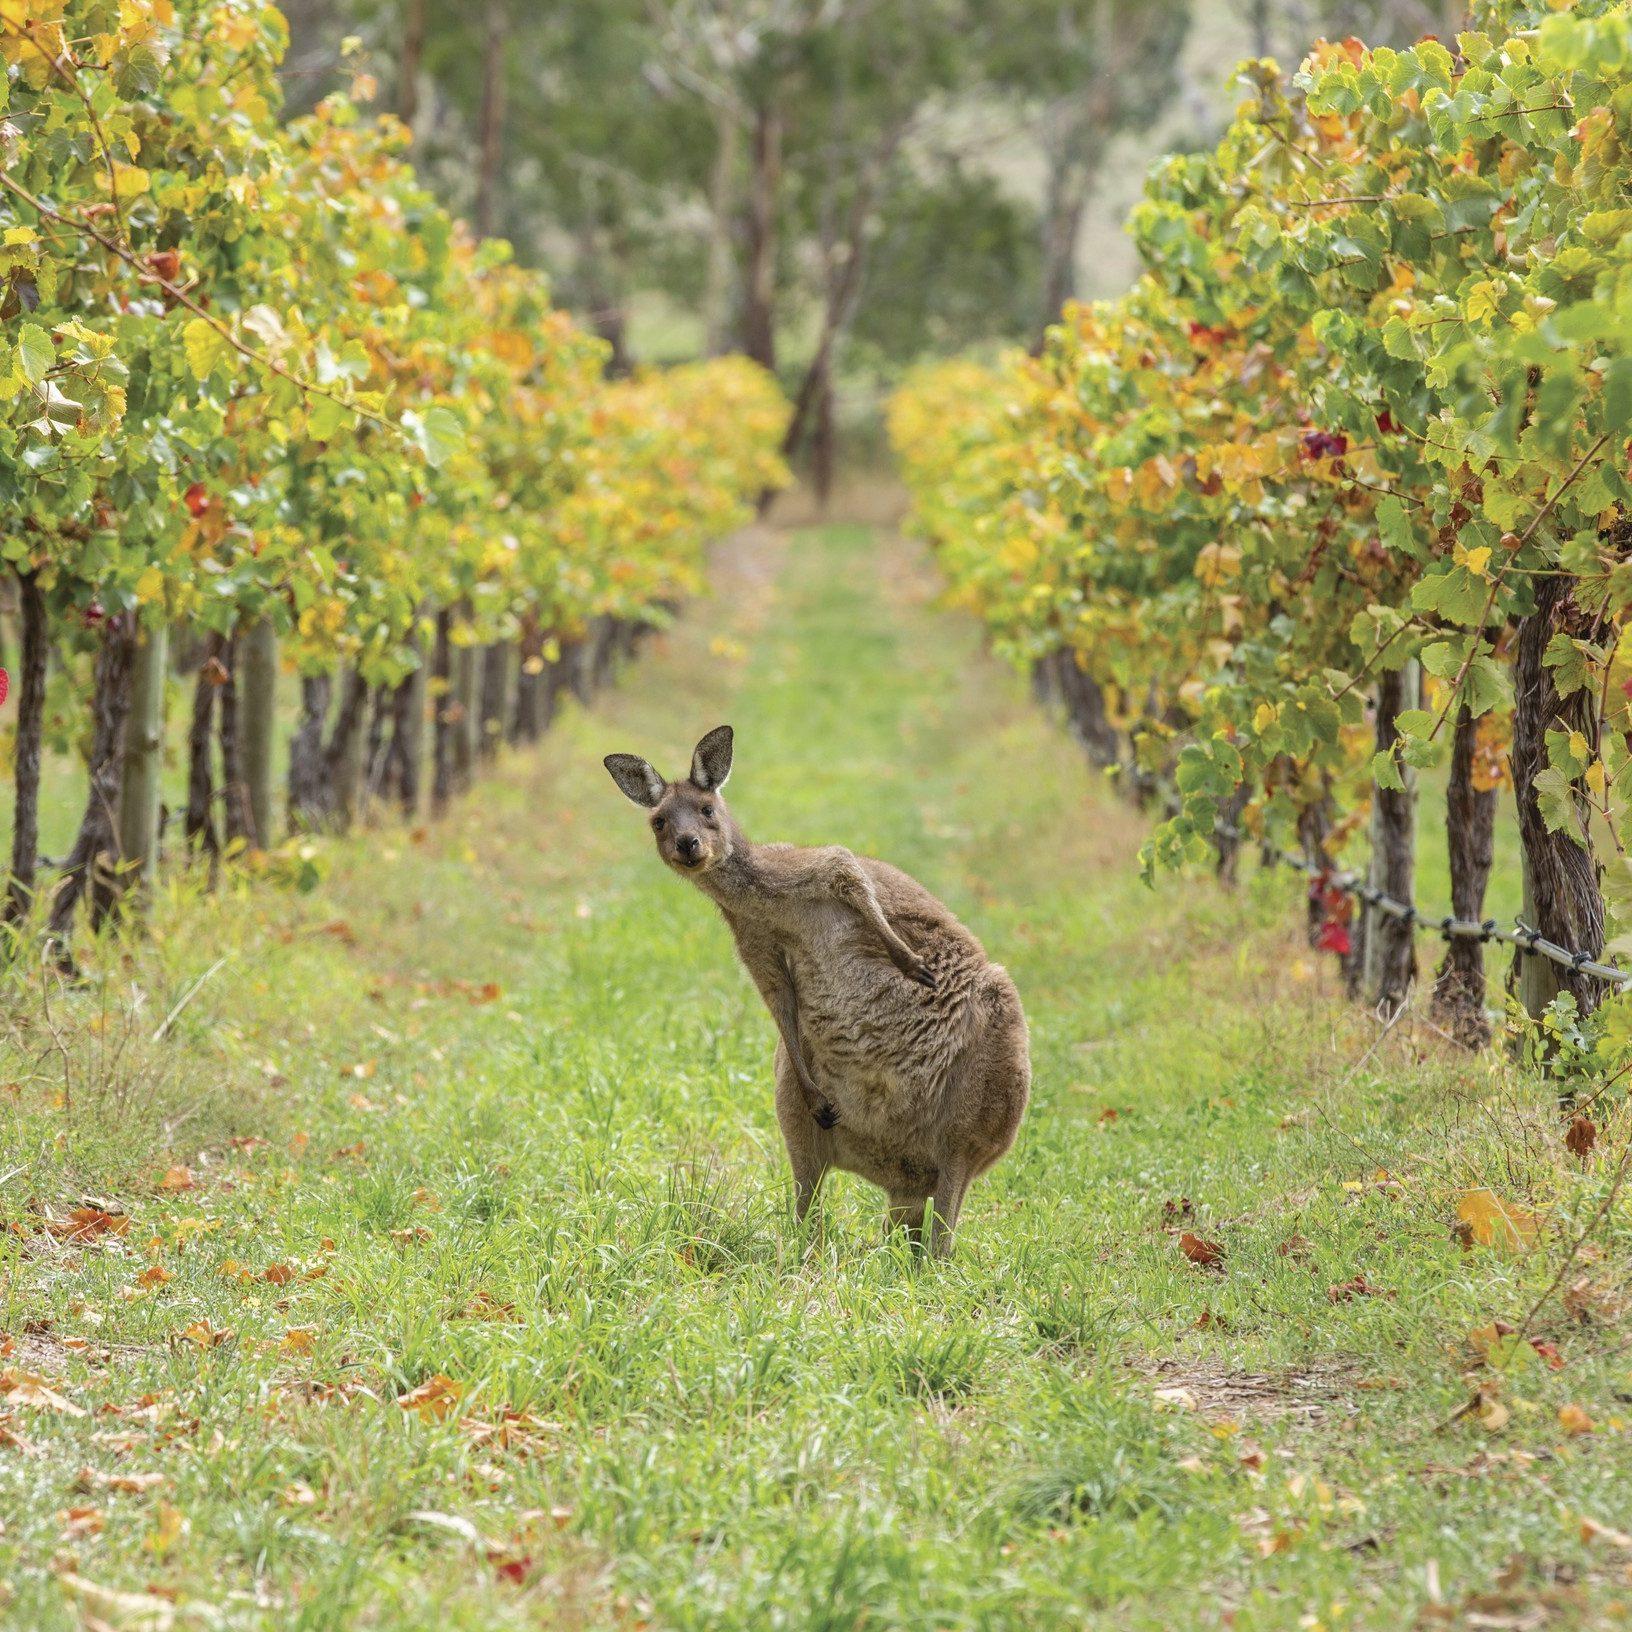 Kangaroo amongst the vines on the Escapegoat Adventures Bike Wine Tour